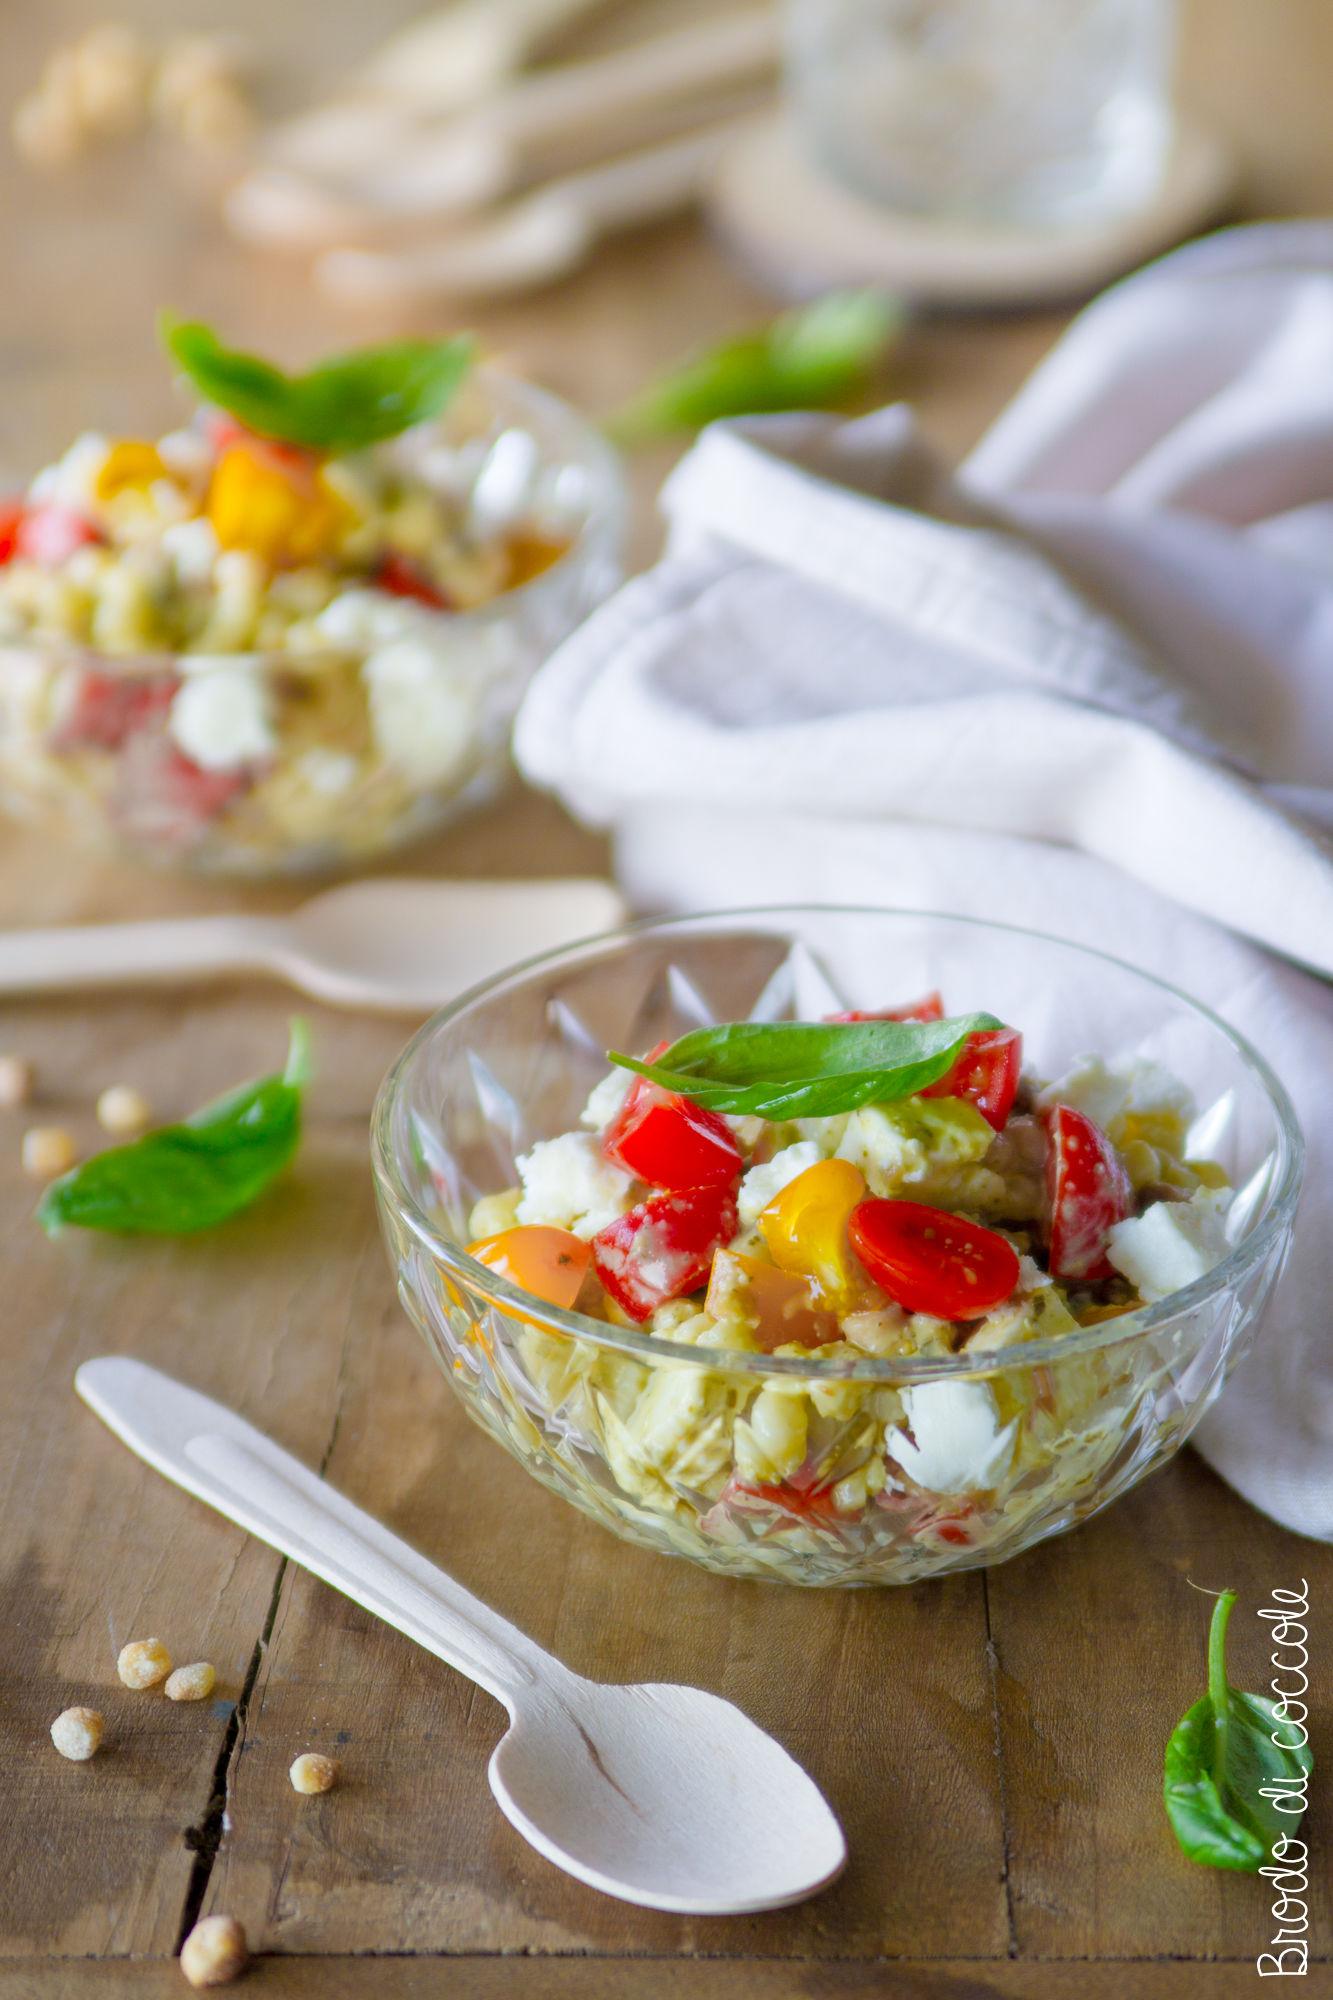 Fregola fredda con pesto, pomodorini e feta